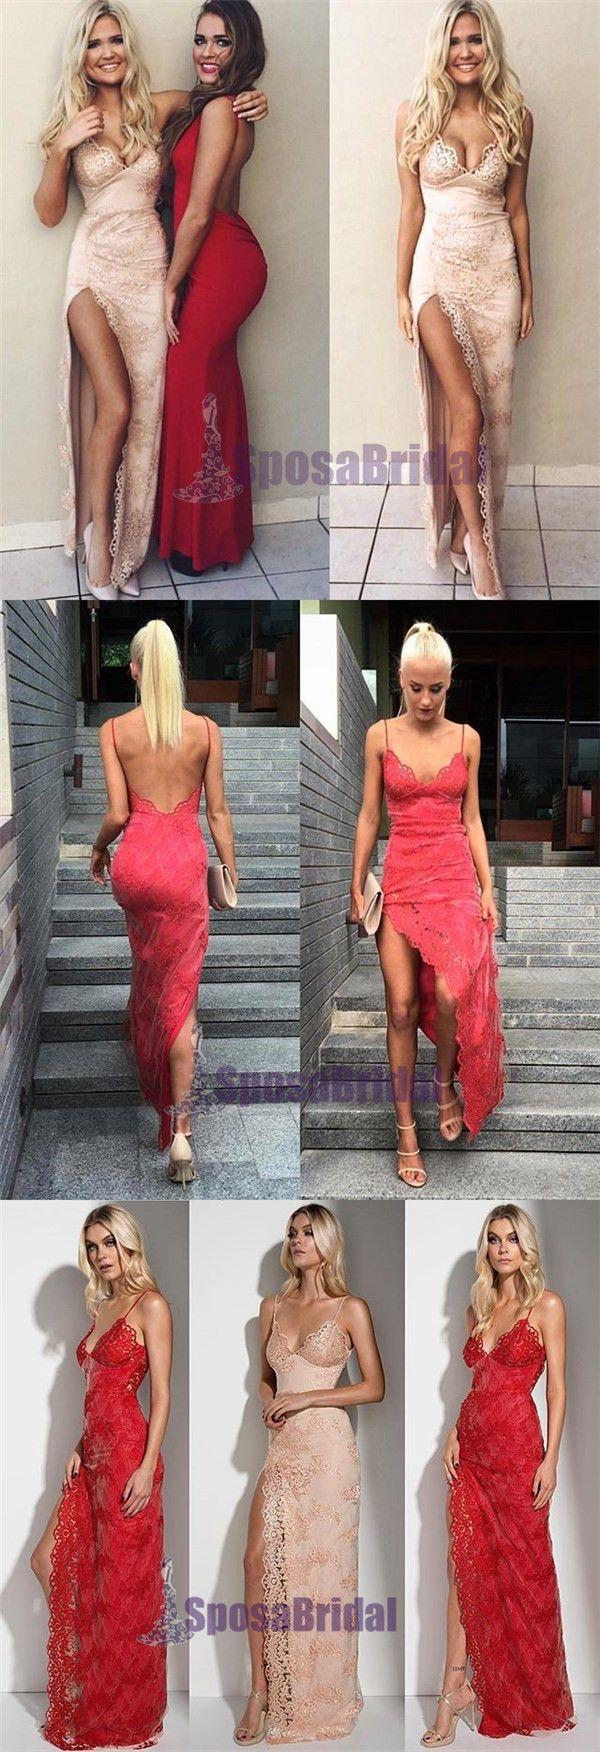 Charming Lace Sexy Spaghetti Straps Mermaid Side Slit Prom Dress, Evening Dress, PD0442